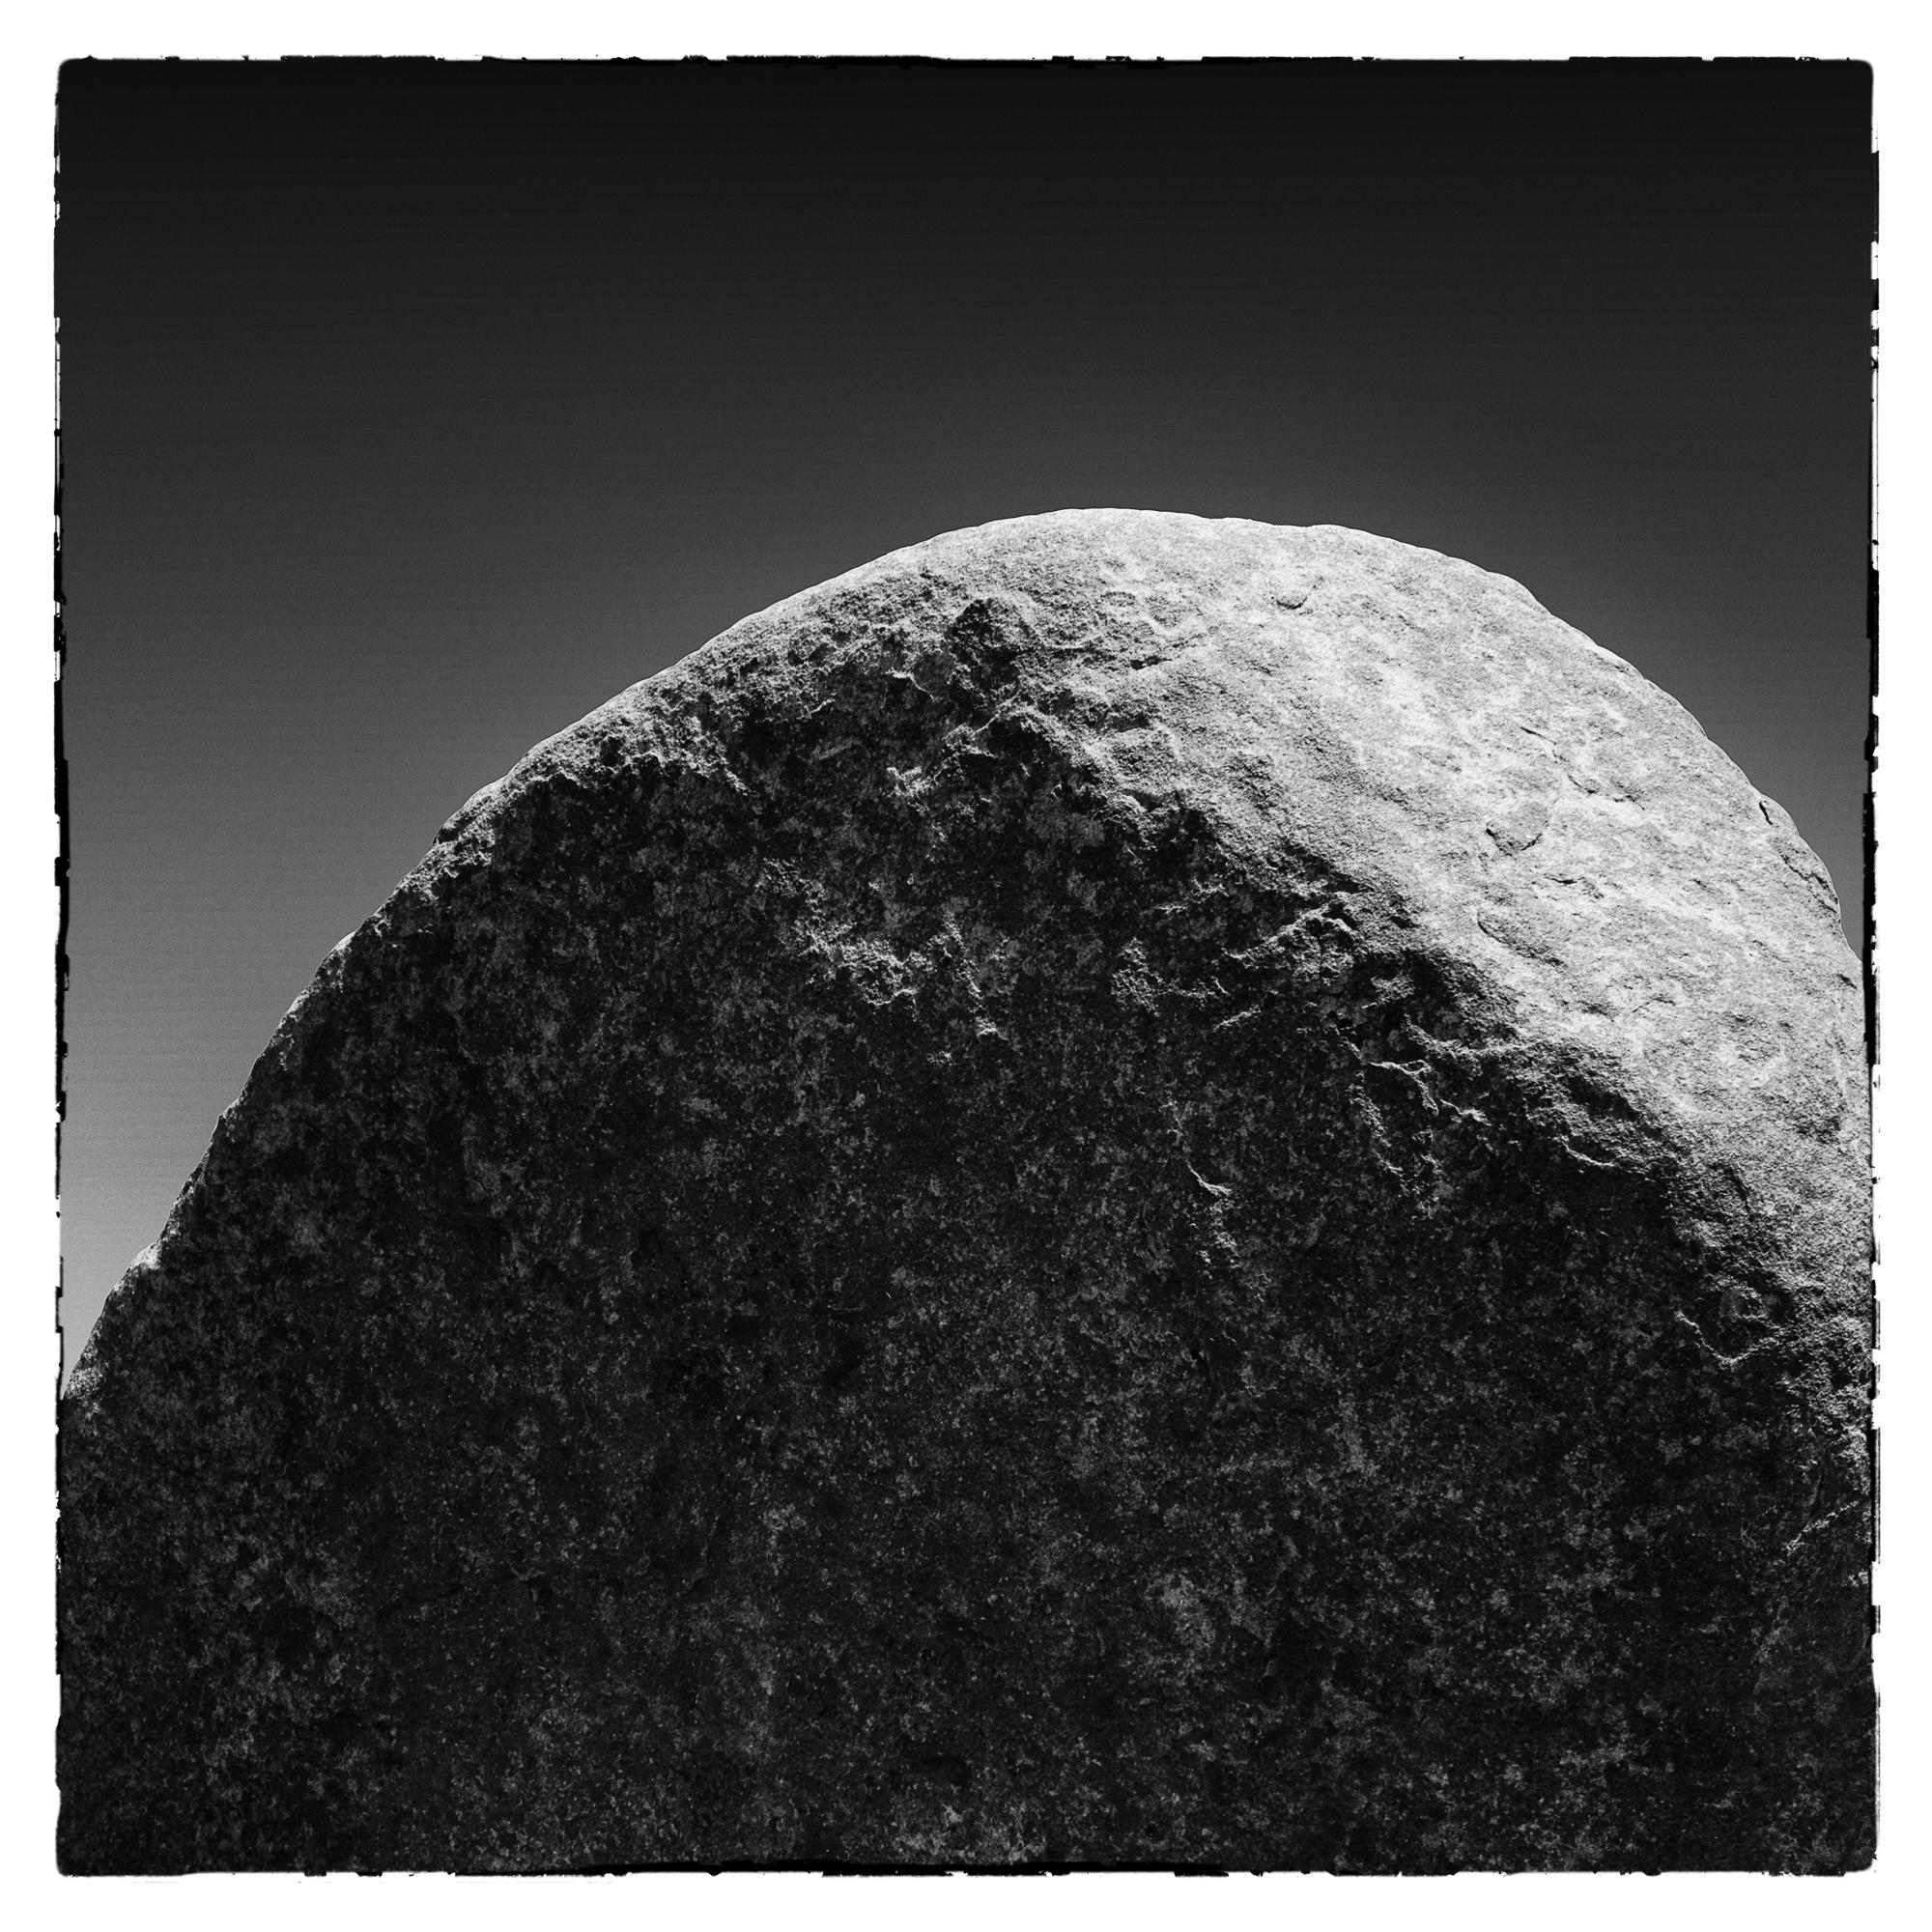 Jumbo Rock JT